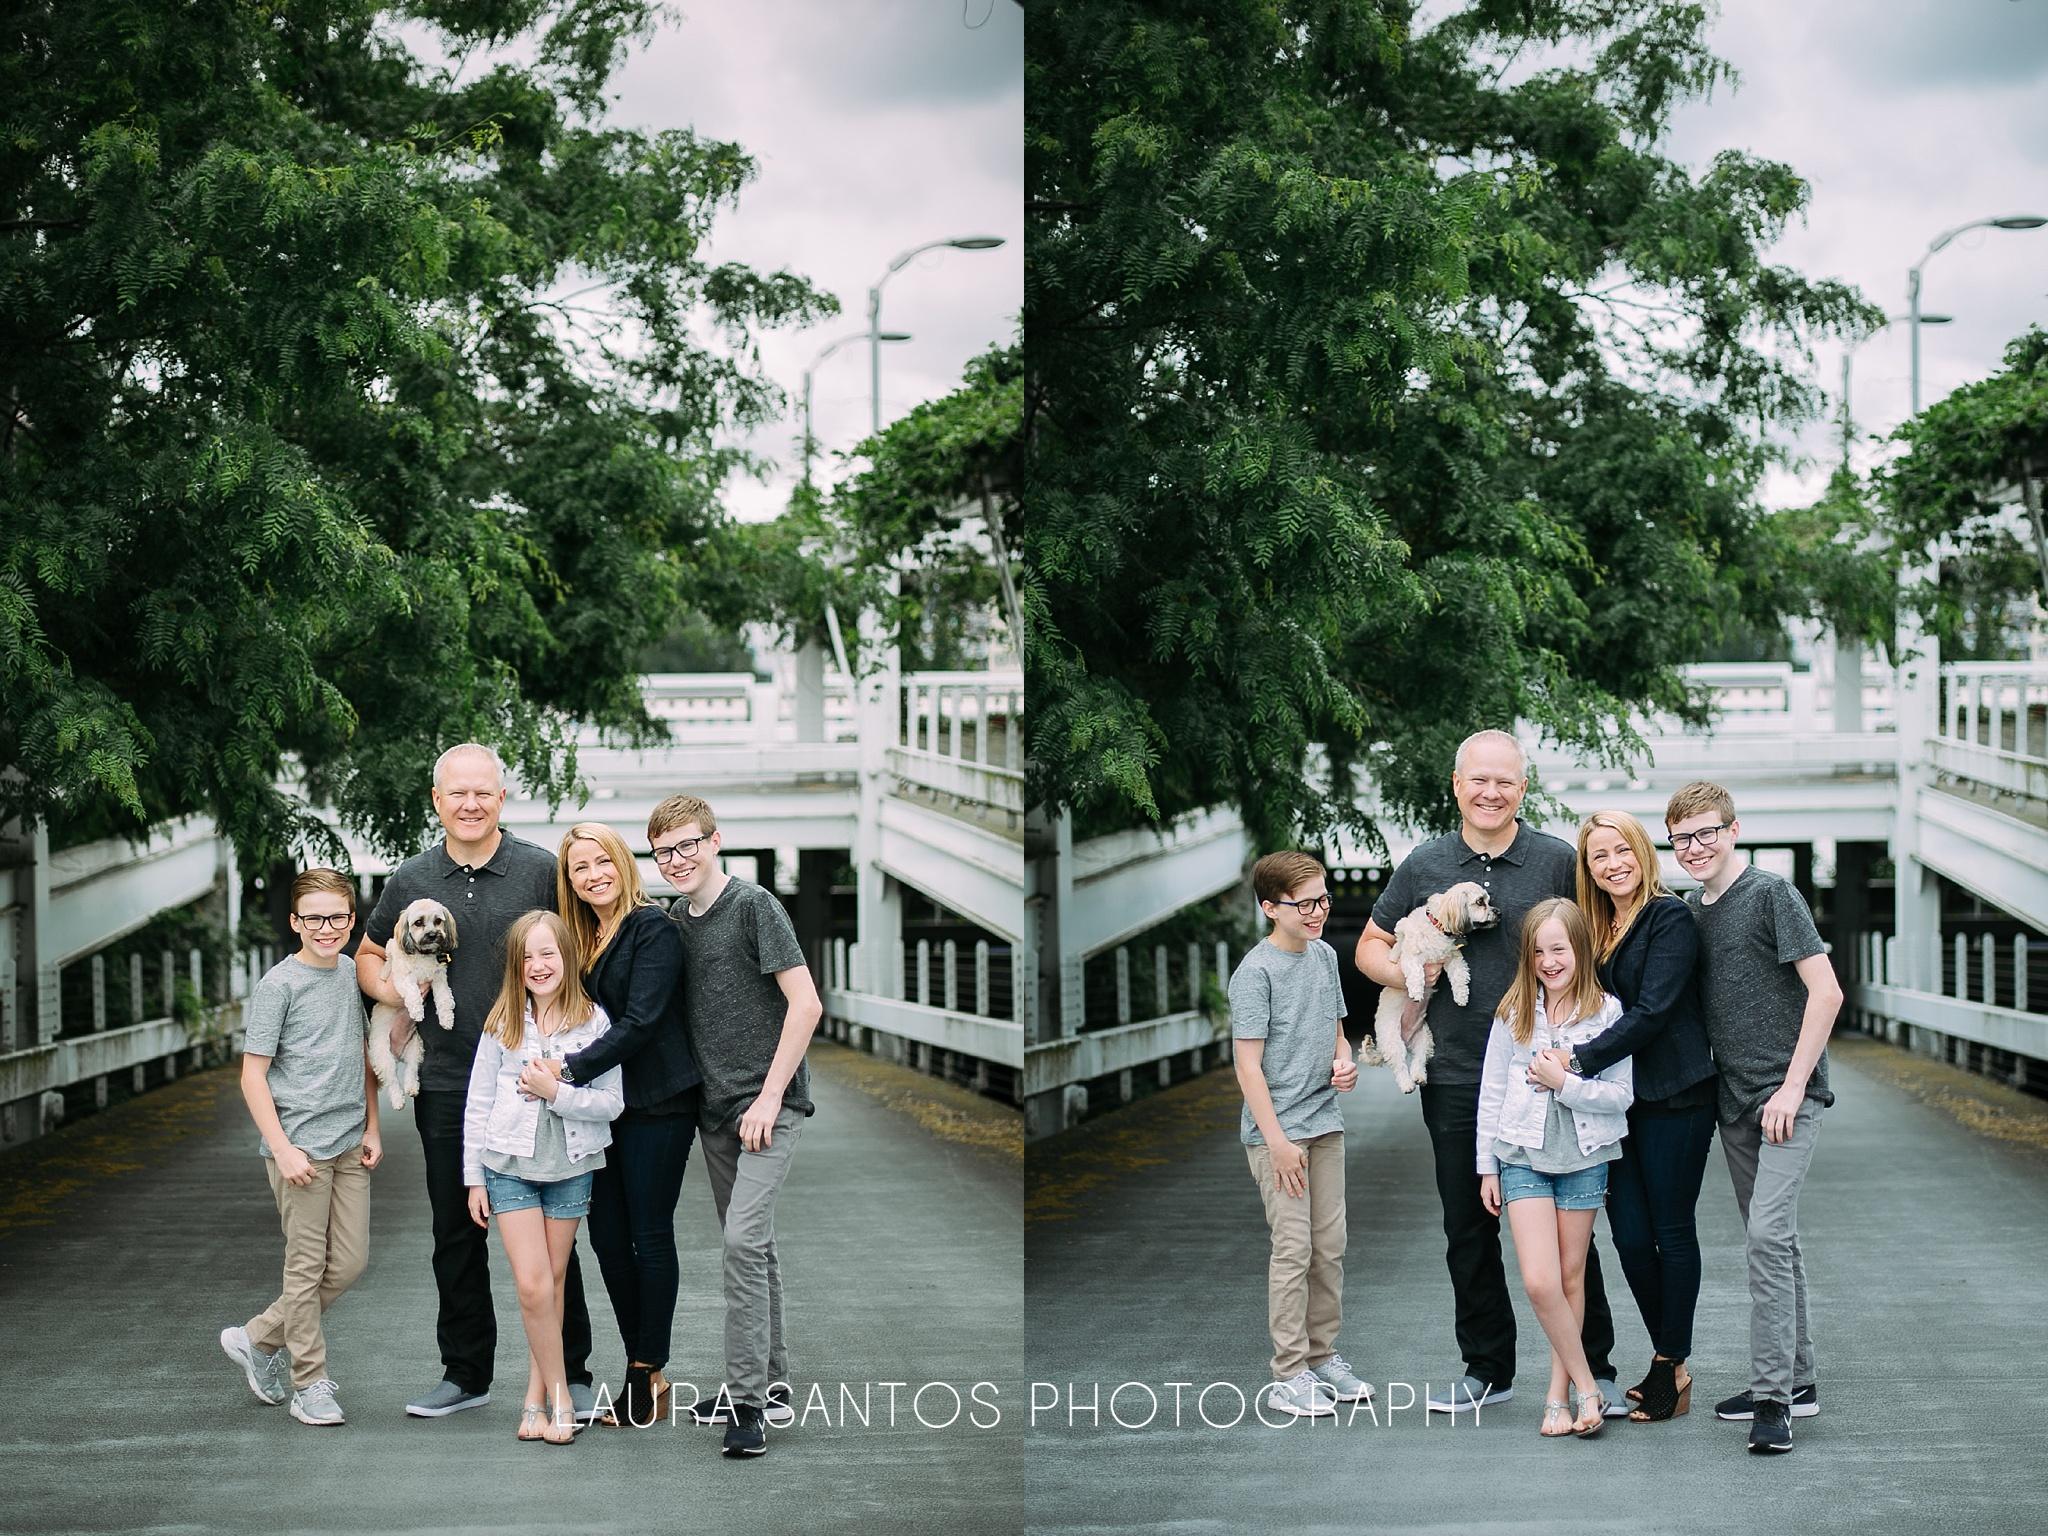 Laura Santos Photography Portland Oregon Family Photographer_0448.jpg